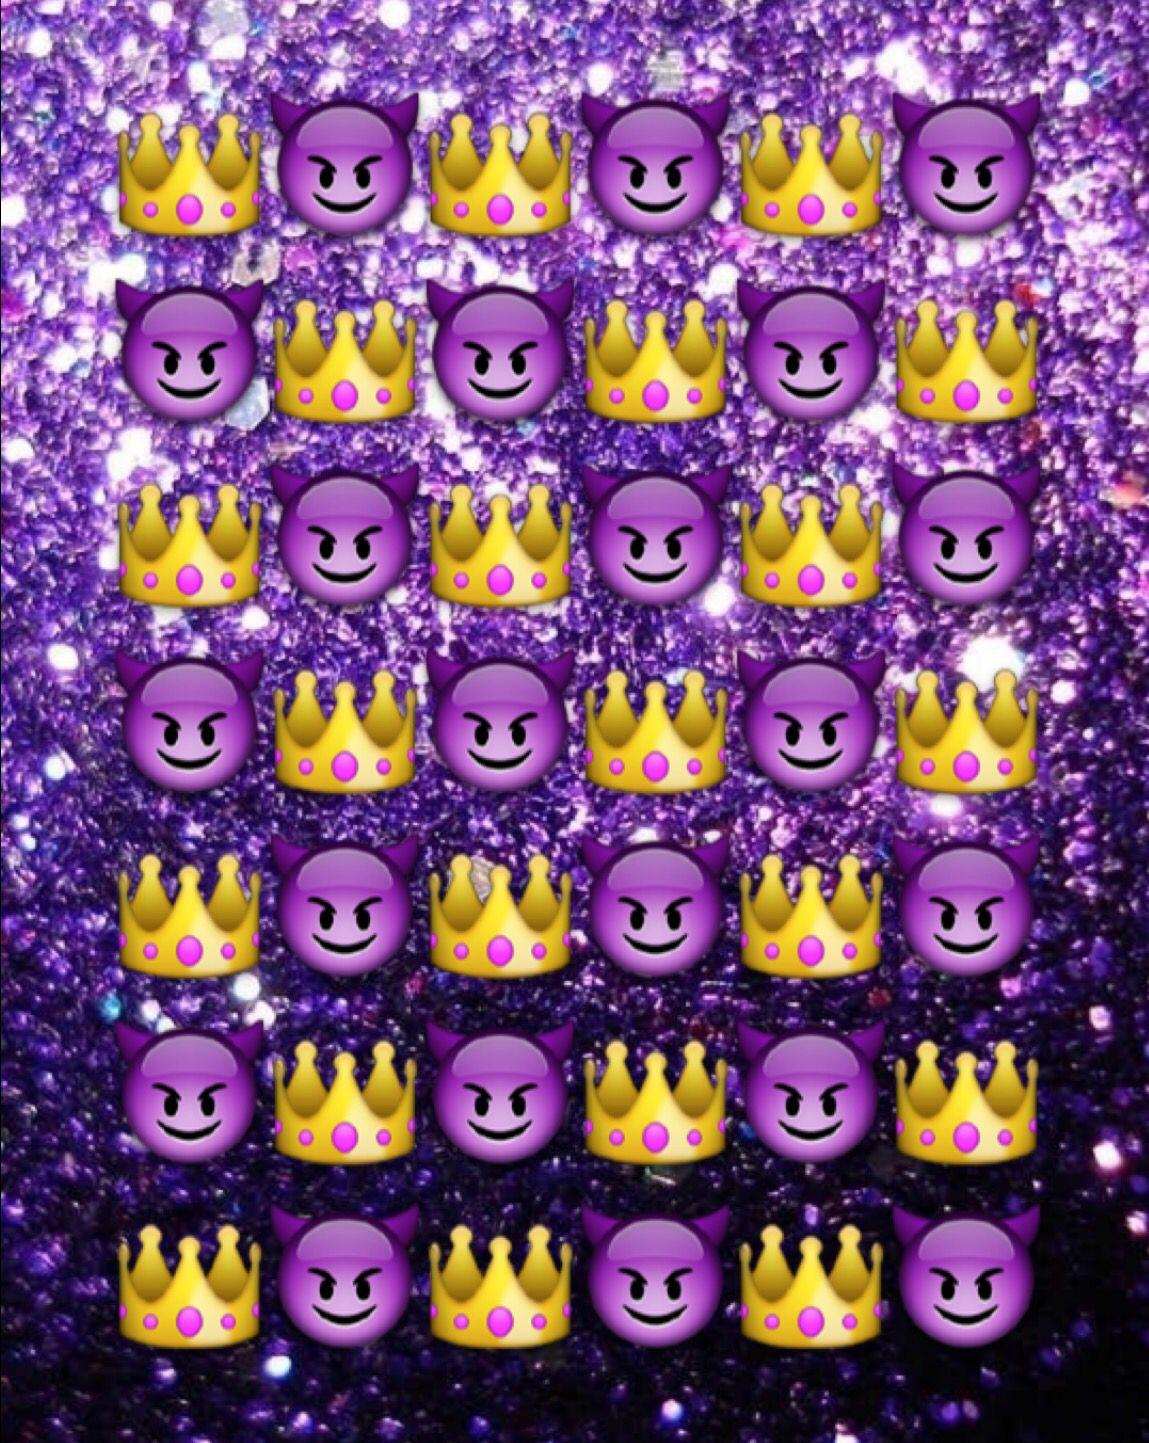 emoji wallpaper background full paper - photo #42